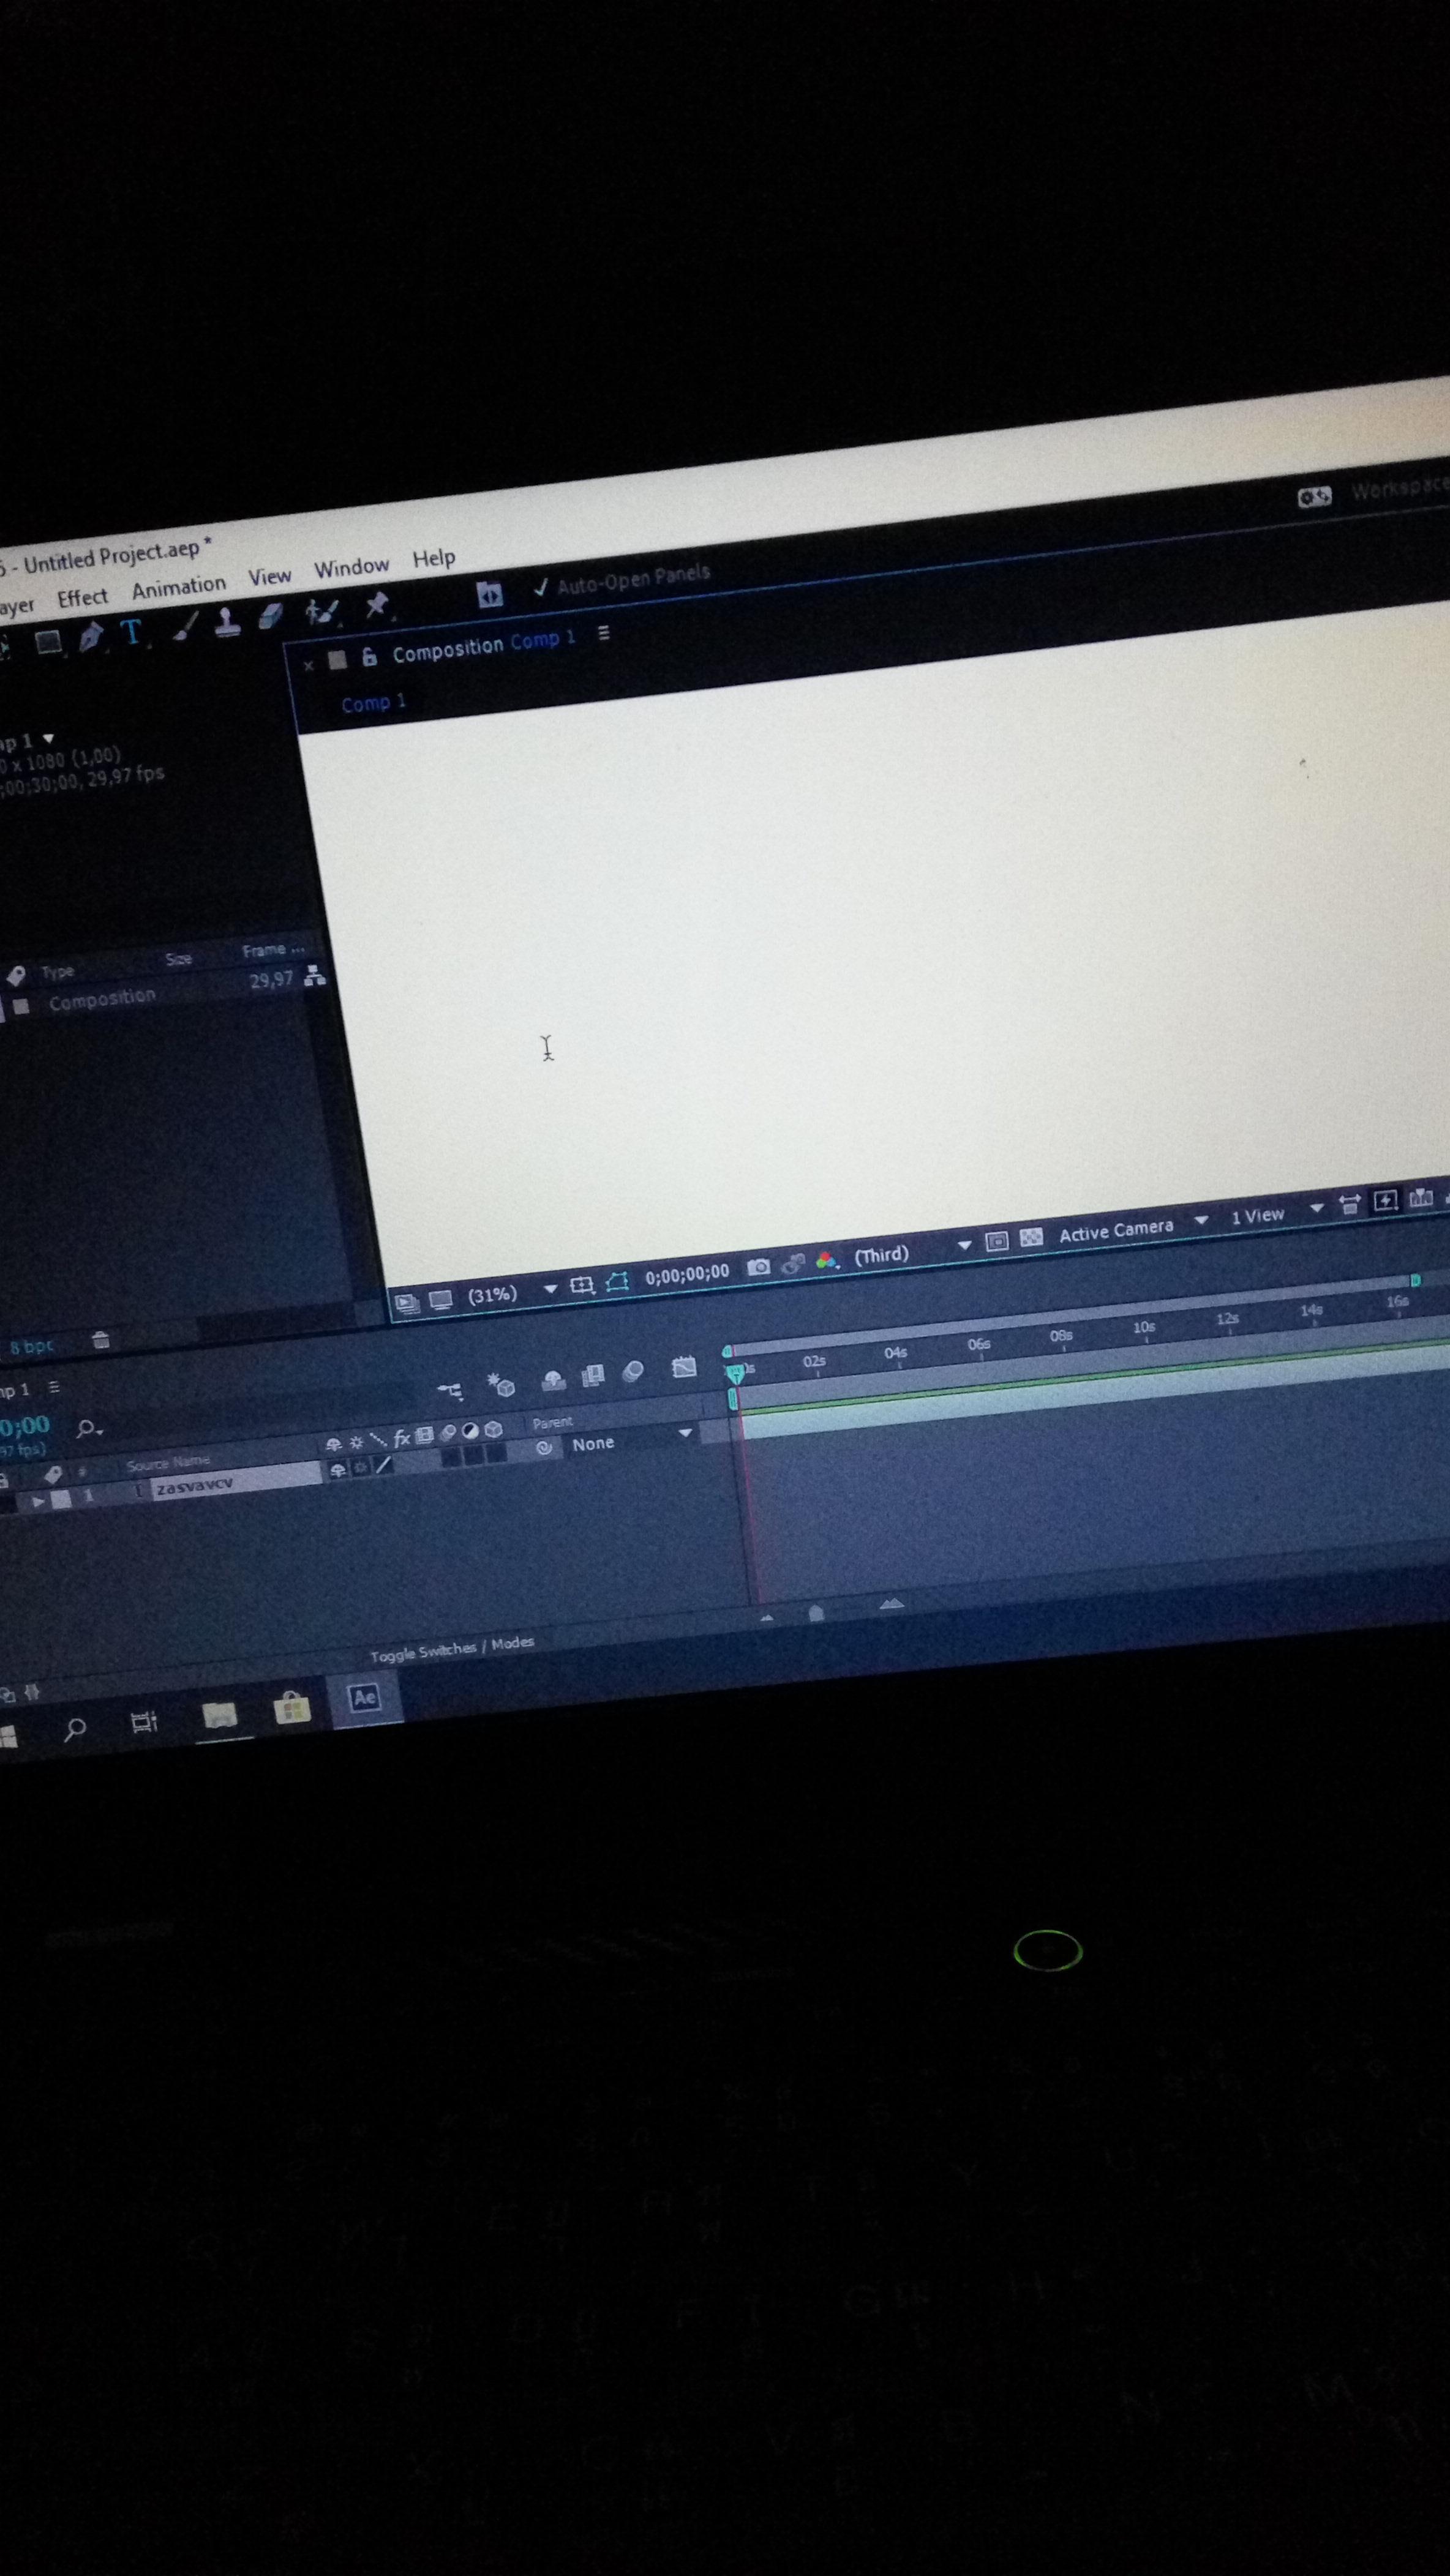 Adobe after effectt blank putih